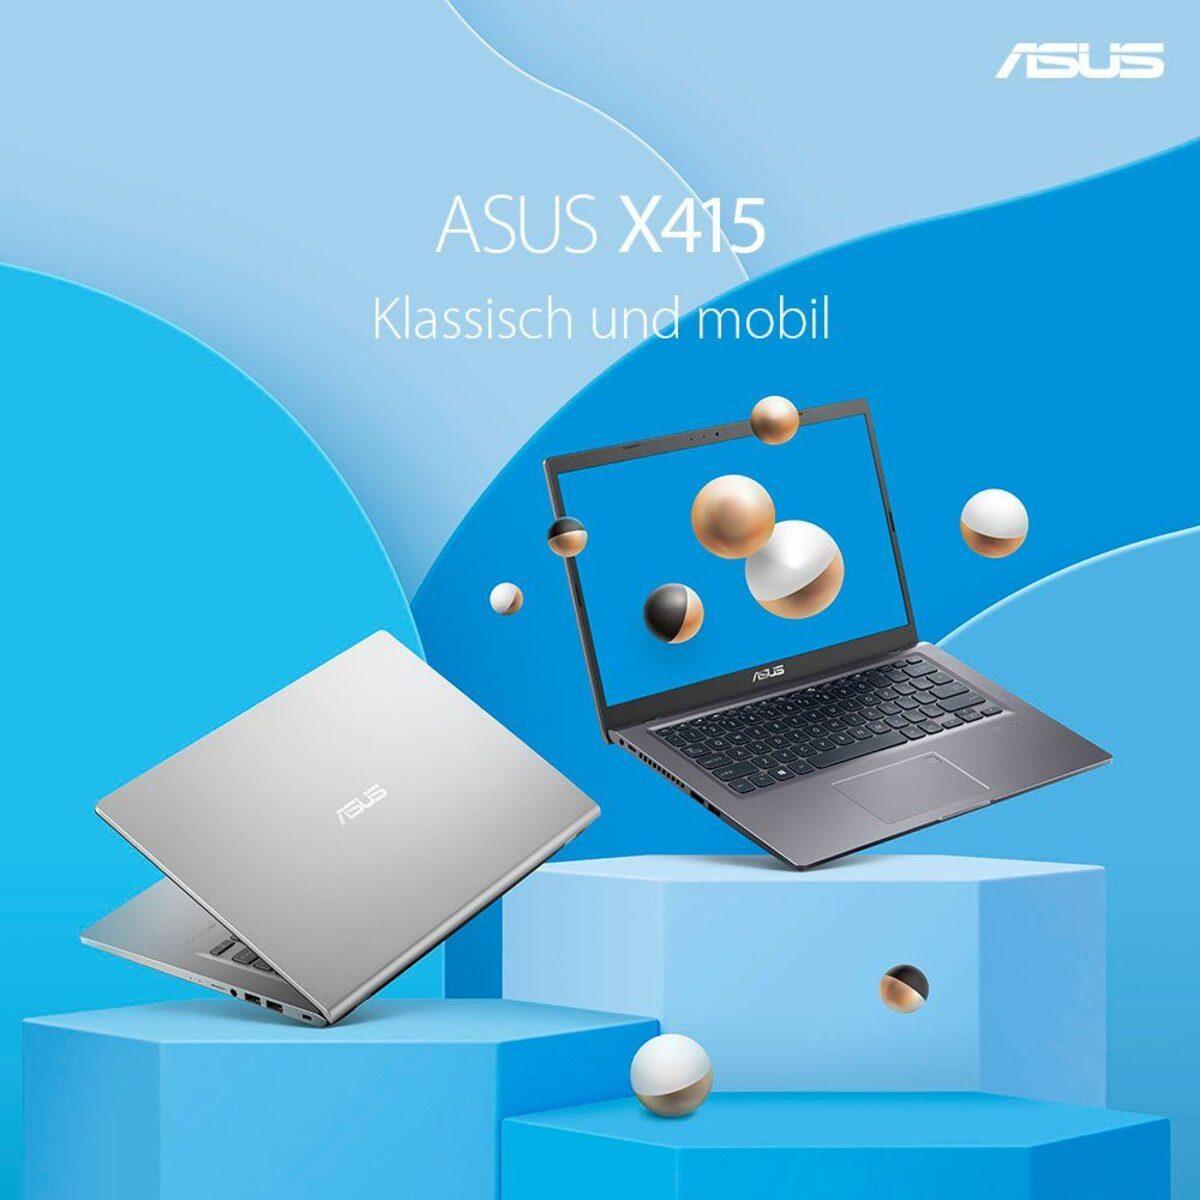 Bild 2 von Asus VivoBook F415JP-EB103T Notebook (35,56 cm/14 Zoll, Intel Core i5, 512 GB SSD)